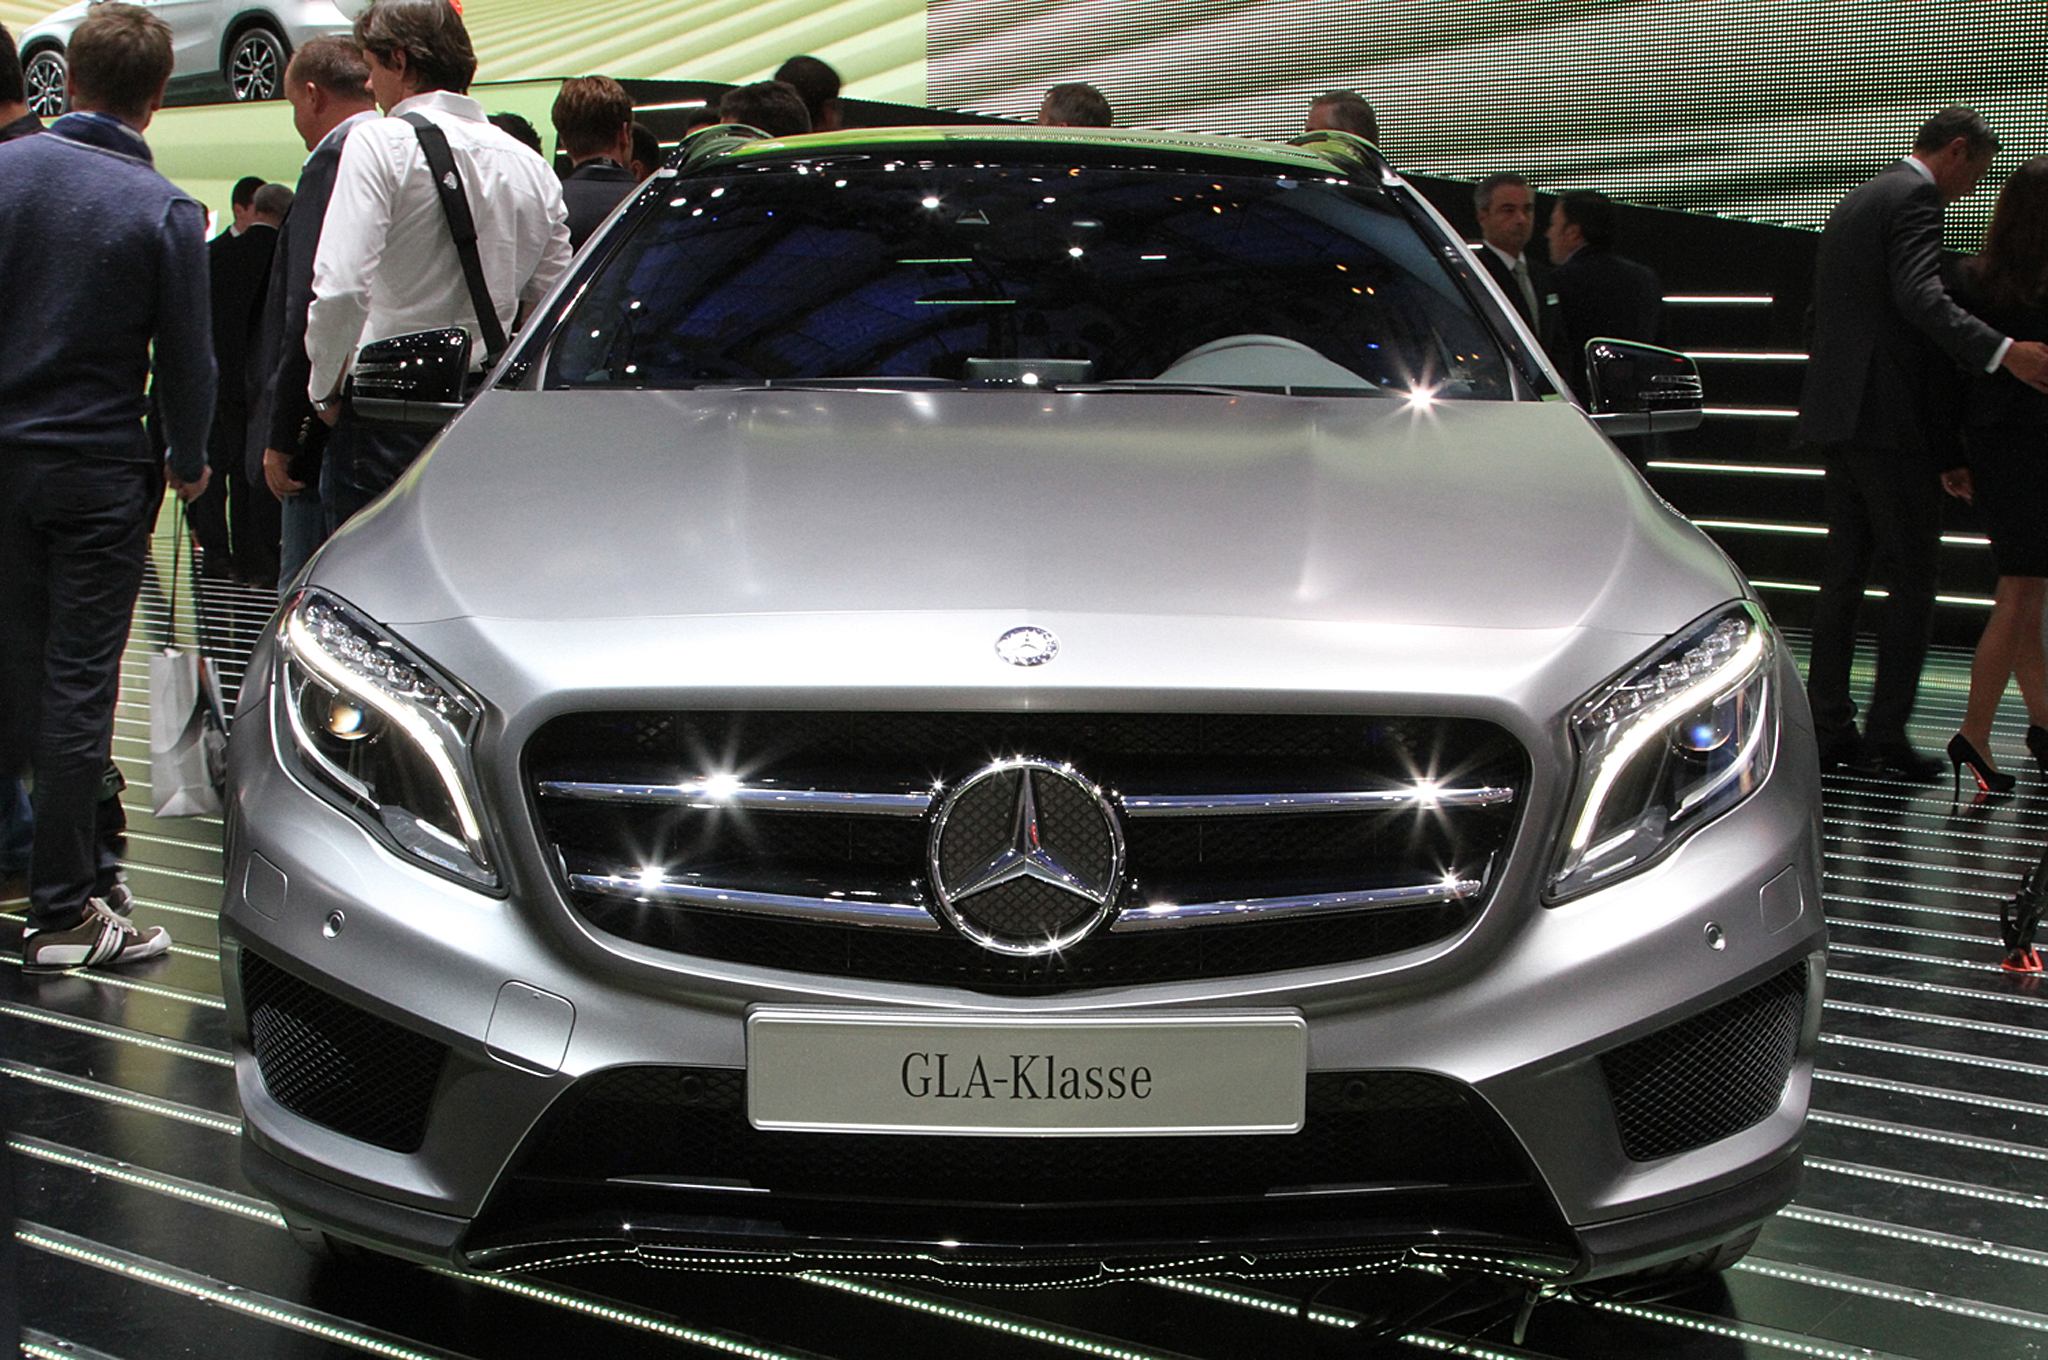 2015 Mercedes-Benz GLA-Class Front Design